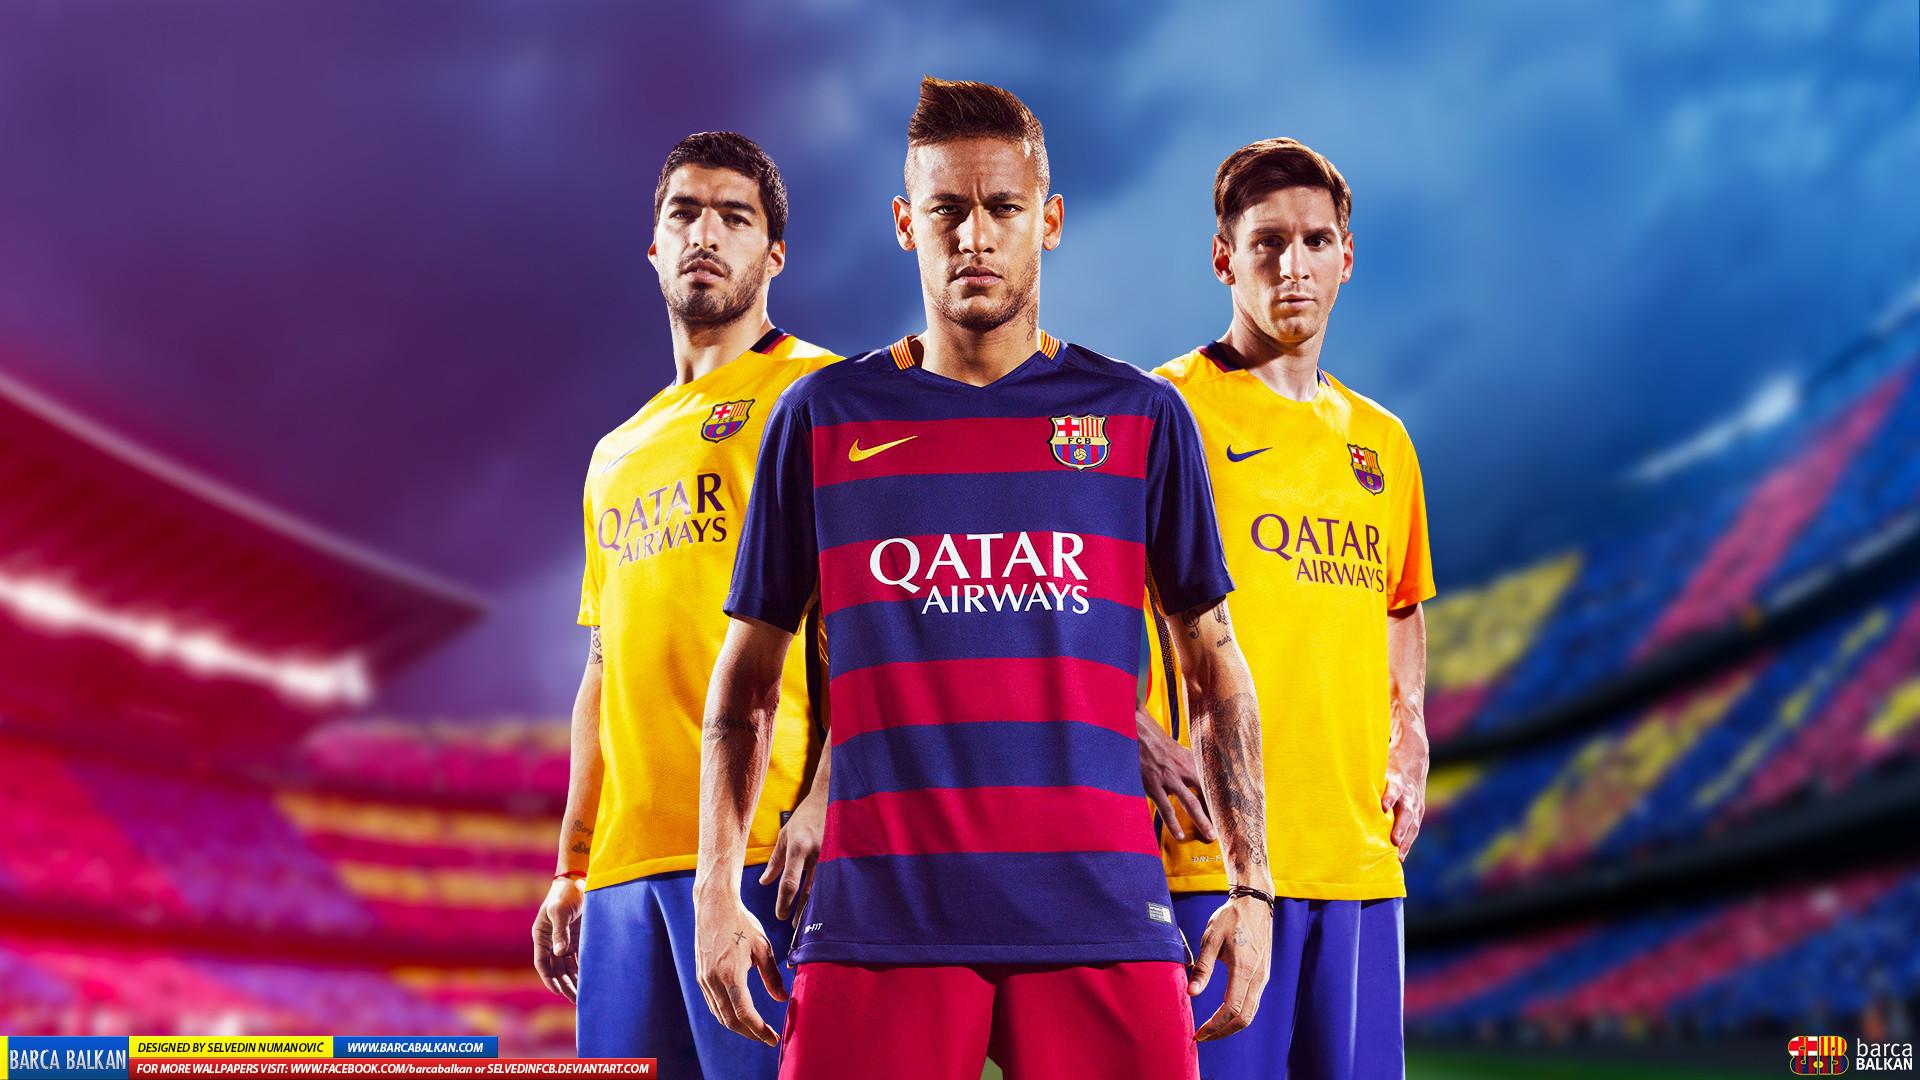 Messi Suarez Neymar HD wallpaper 2015 by SelvedinFCB on DeviantArt